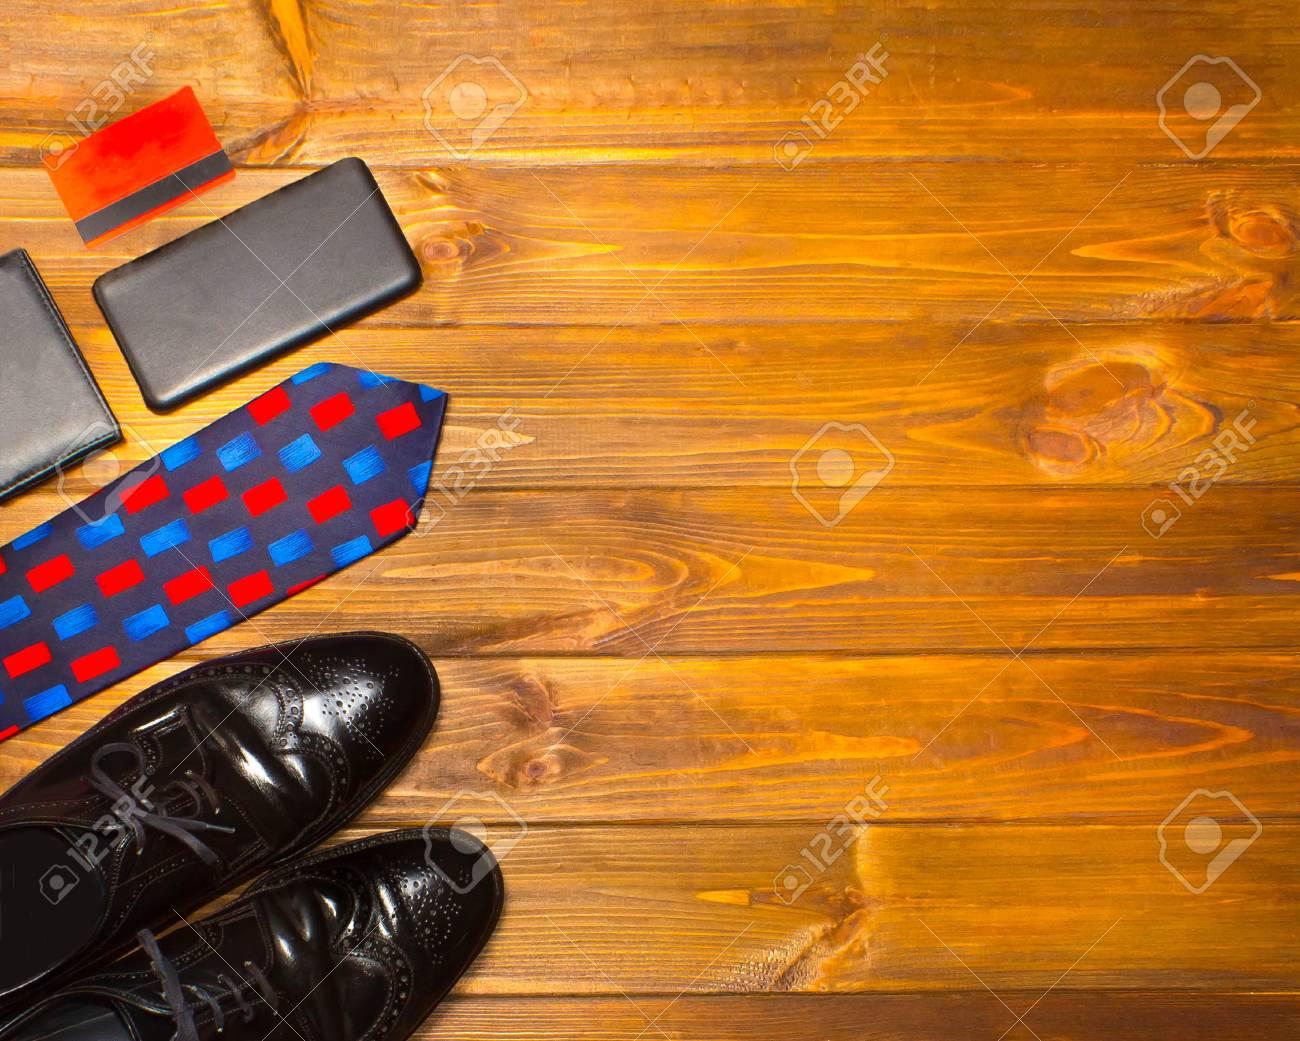 The Elegant Male Set Mens Shoes Leather Belt On Wooden Background